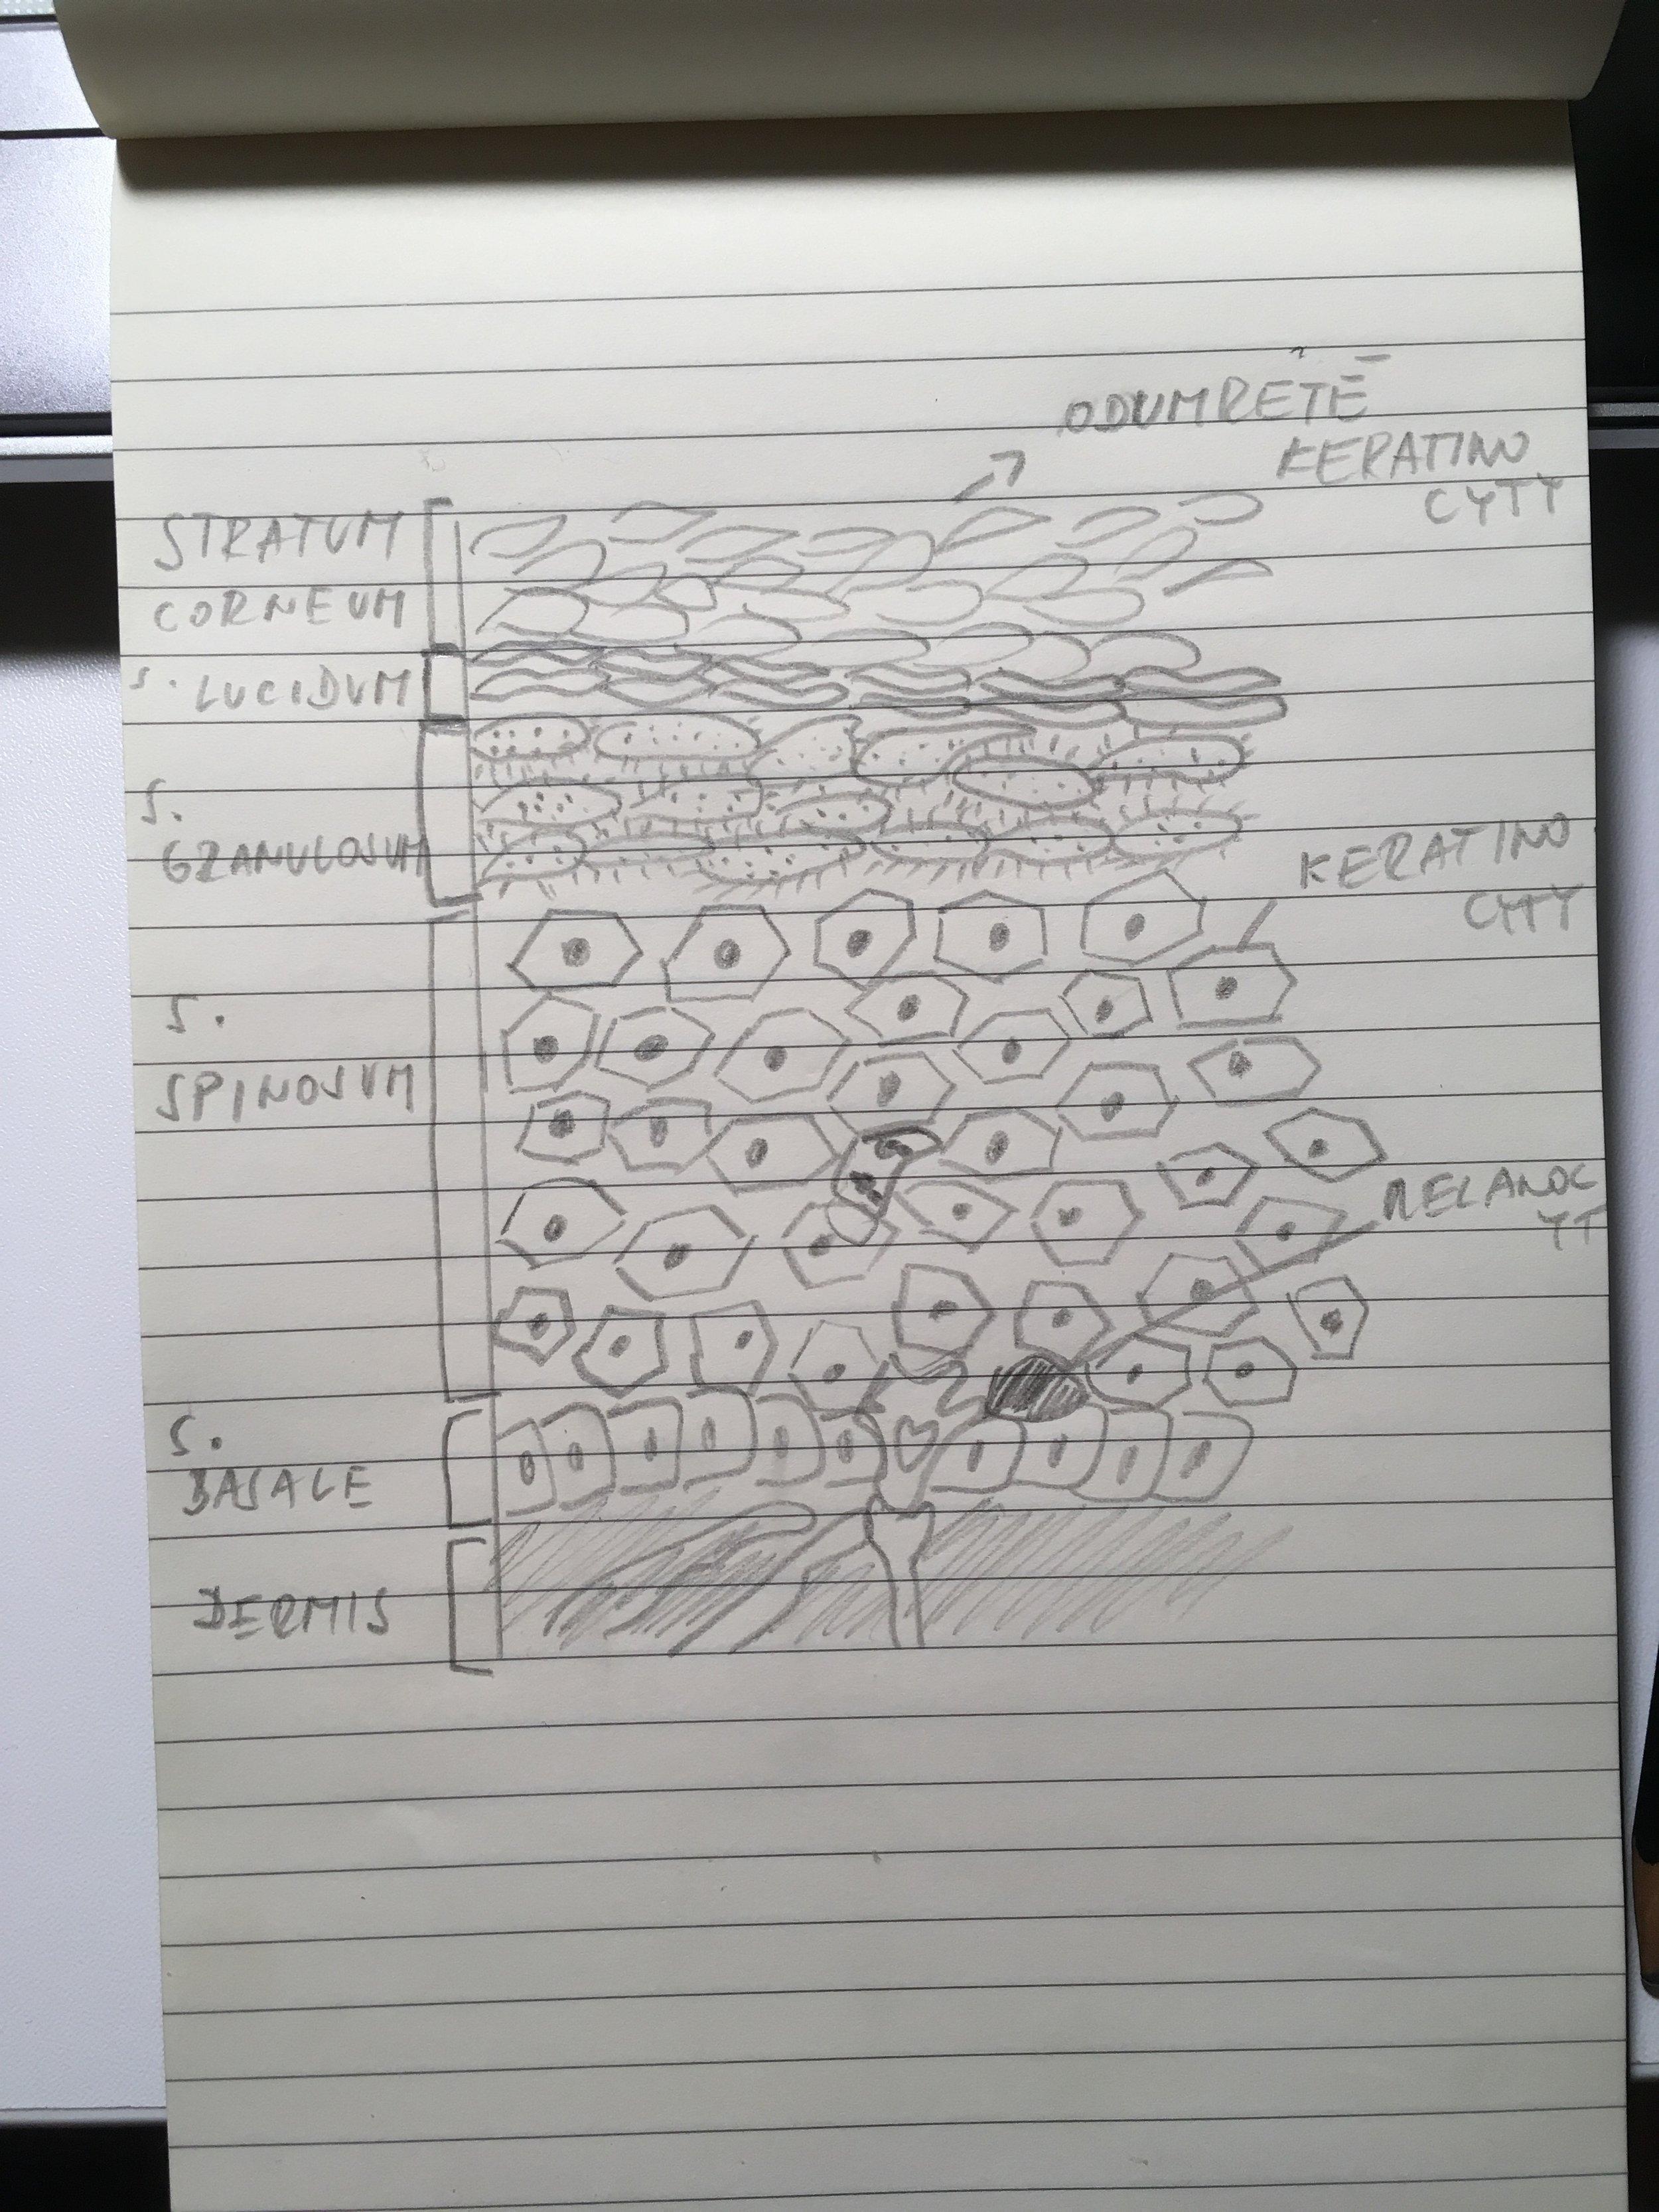 Vôbec neviem kresliť, ale aspoň neporušujem autorské práva ;)